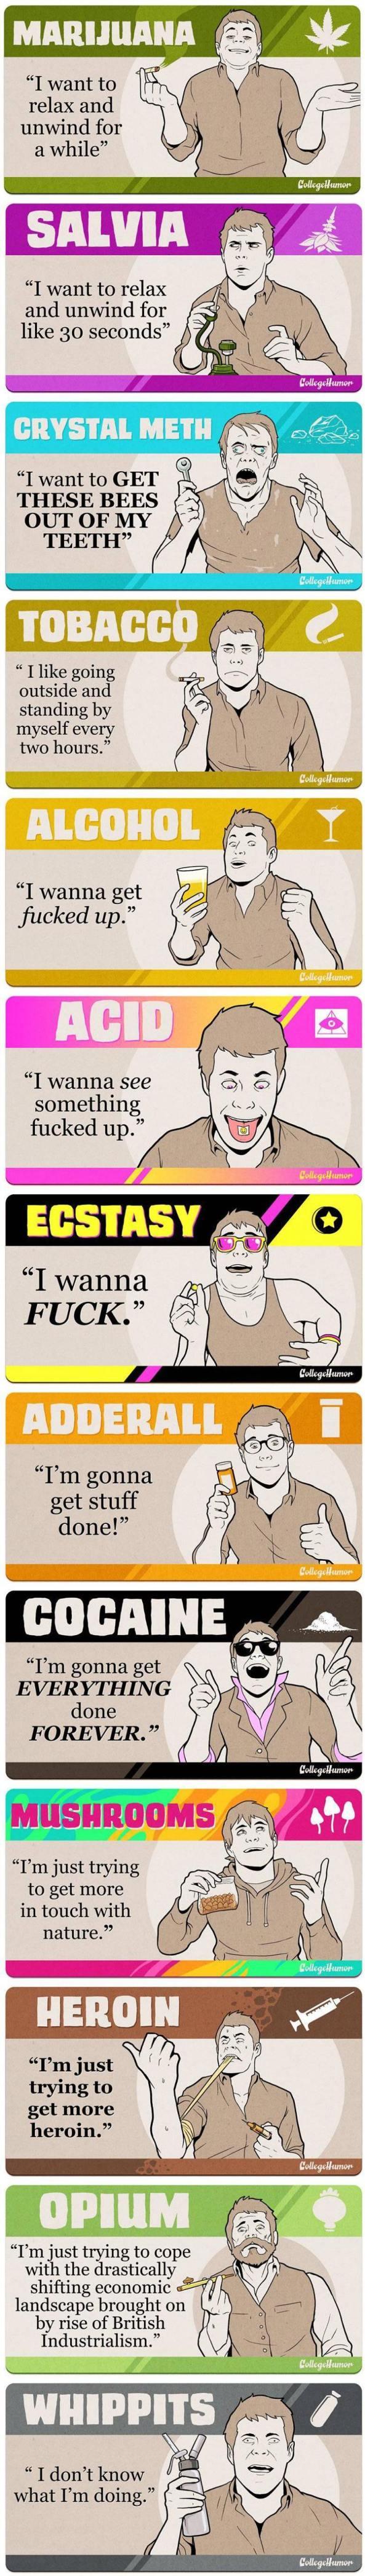 drug guide